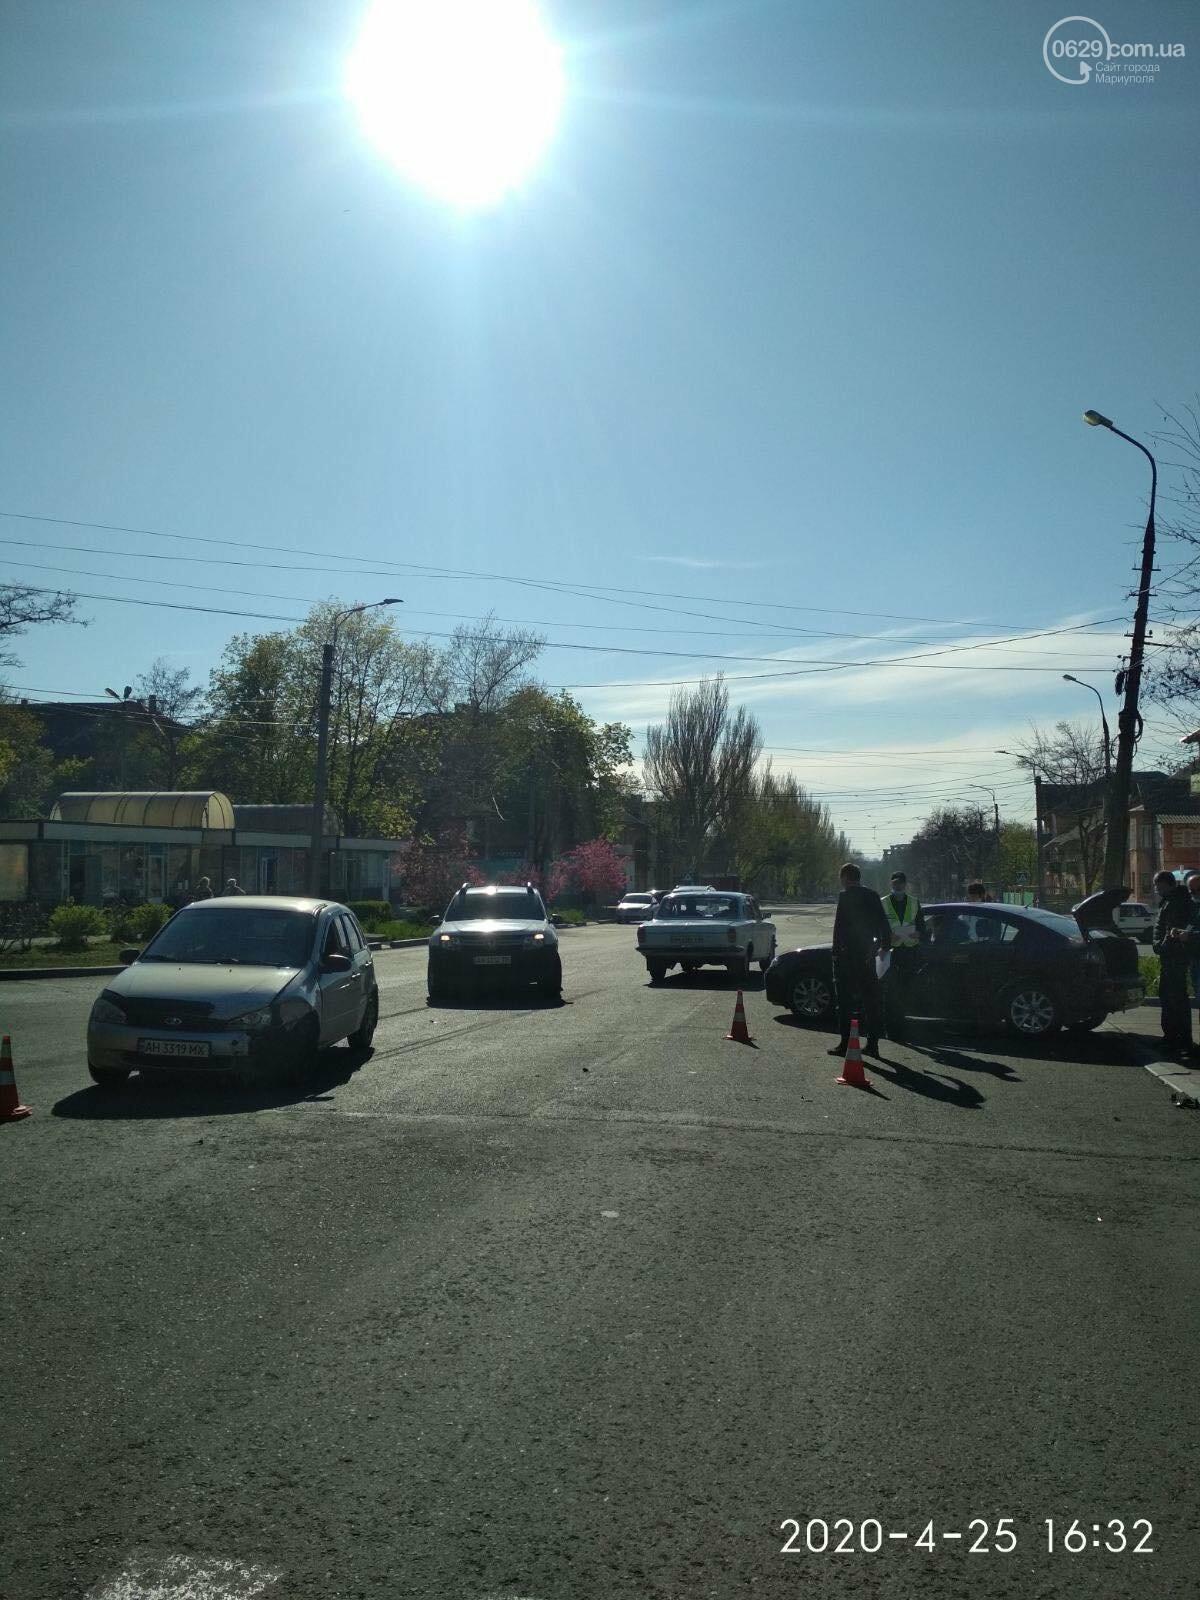 В Левобережном районе в аварии пострадала девушка, - ФОТО, фото-1